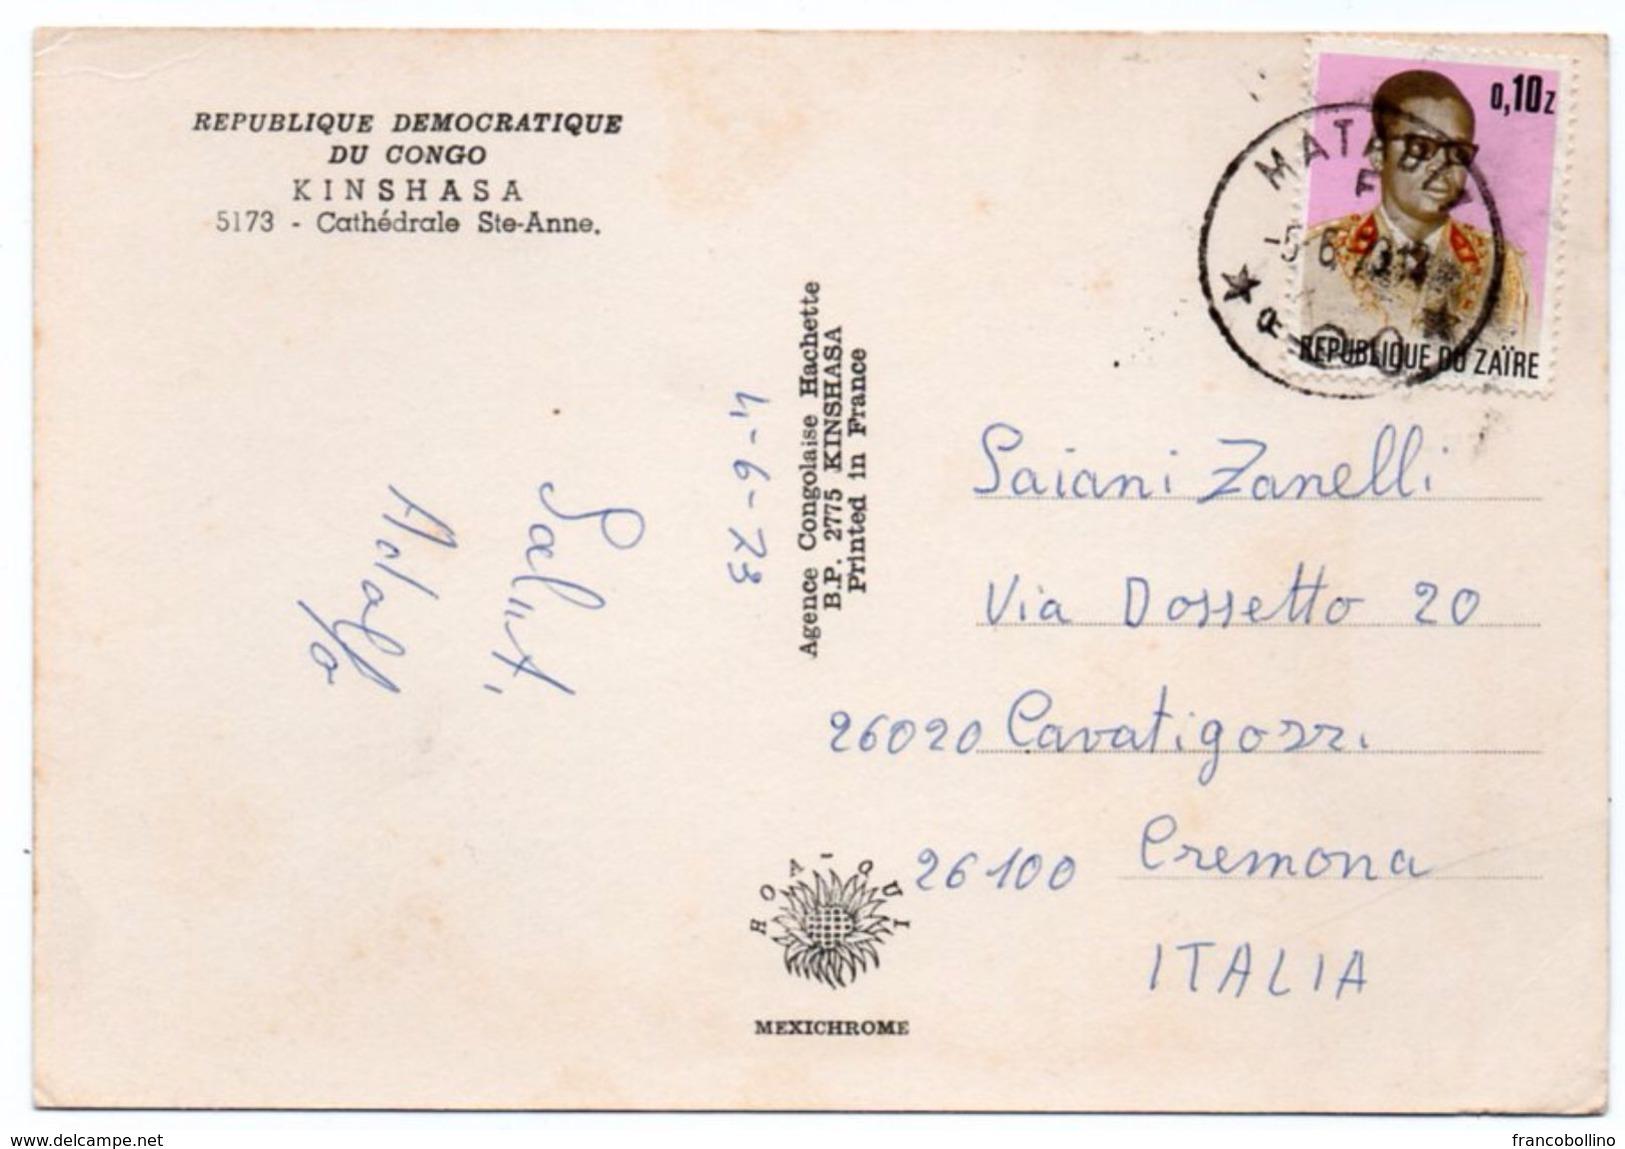 CONGO/ZAIRE - KINSHASA (LEOPOLDVILLE) CATHEDRALE STE-ANNE - Kinshasa - Leopoldville